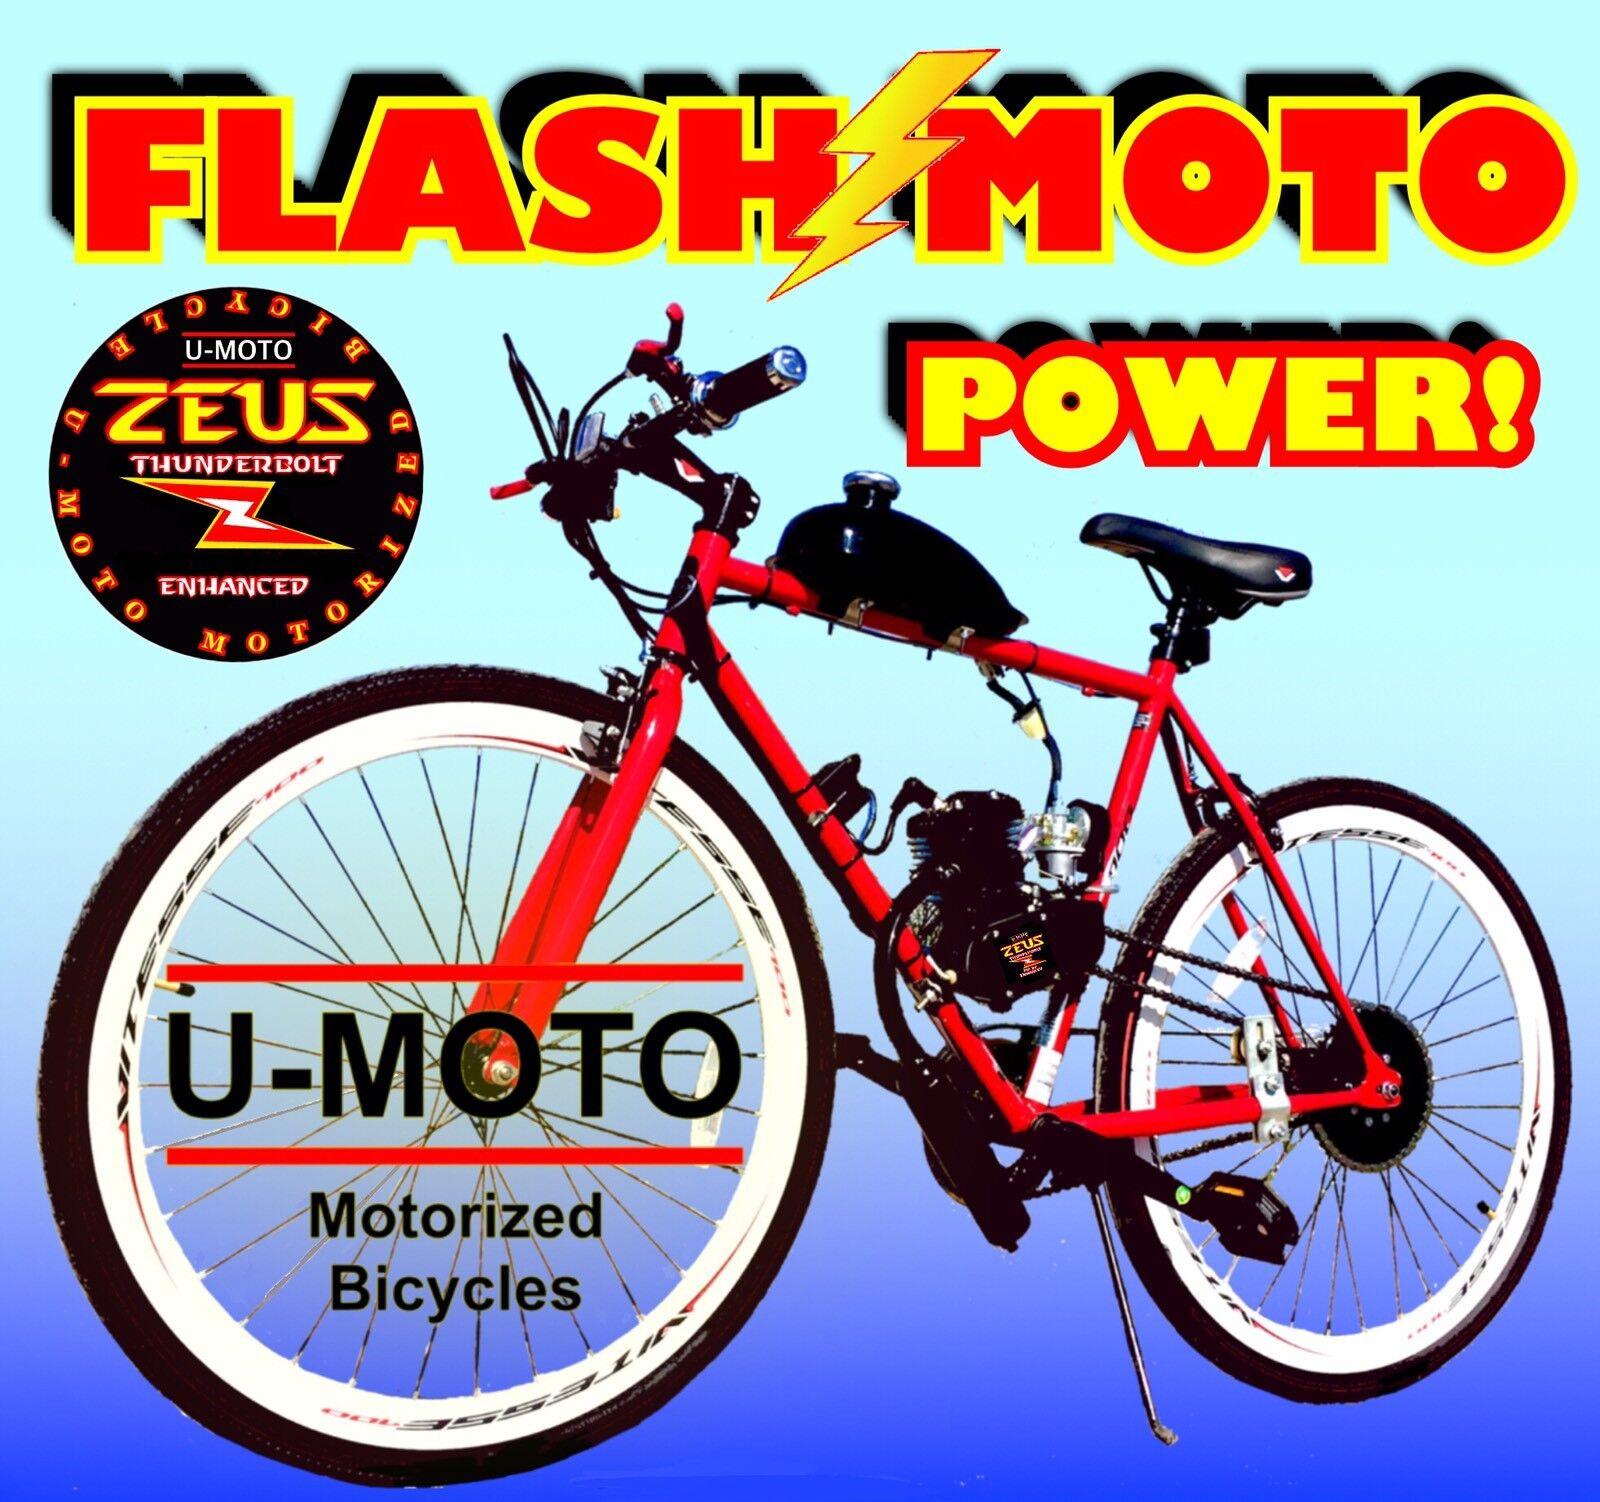 2-STROKE 66CC 80CC MOTORIZED BIKE ENGINE KIT WITH  26  BICYCLE